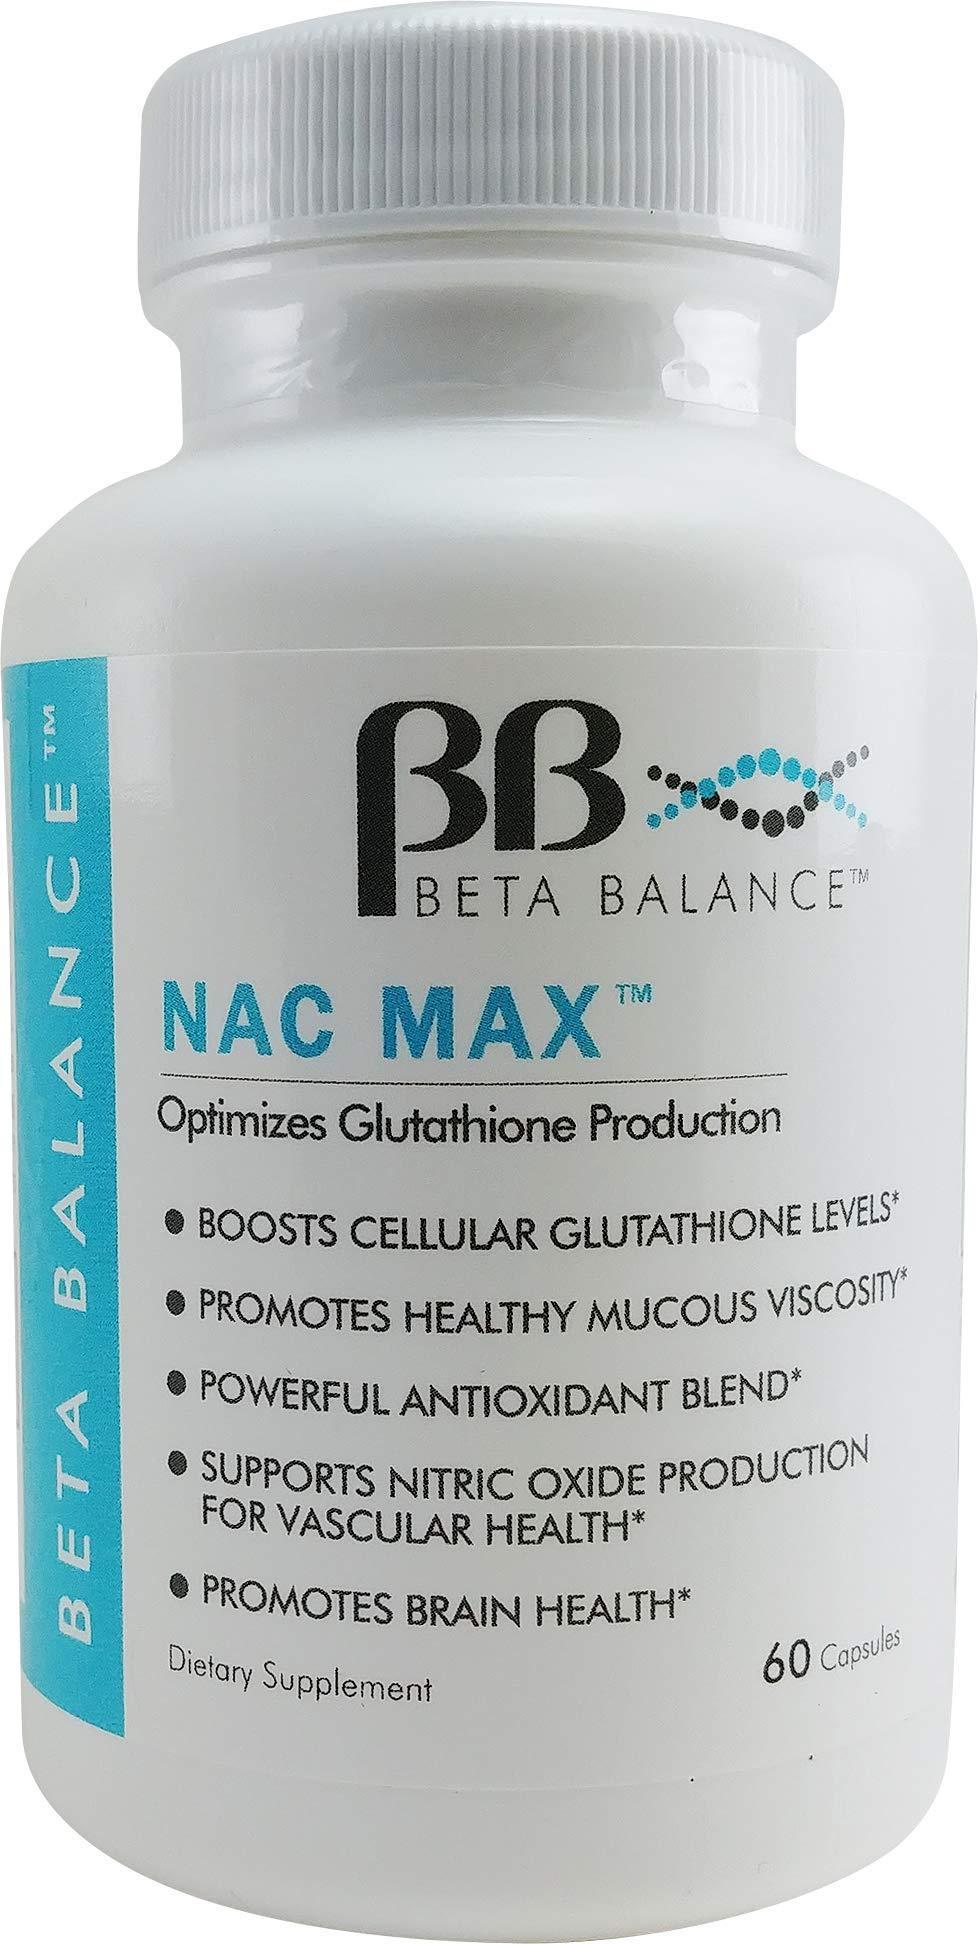 NAC MAXTM by Beta Balance